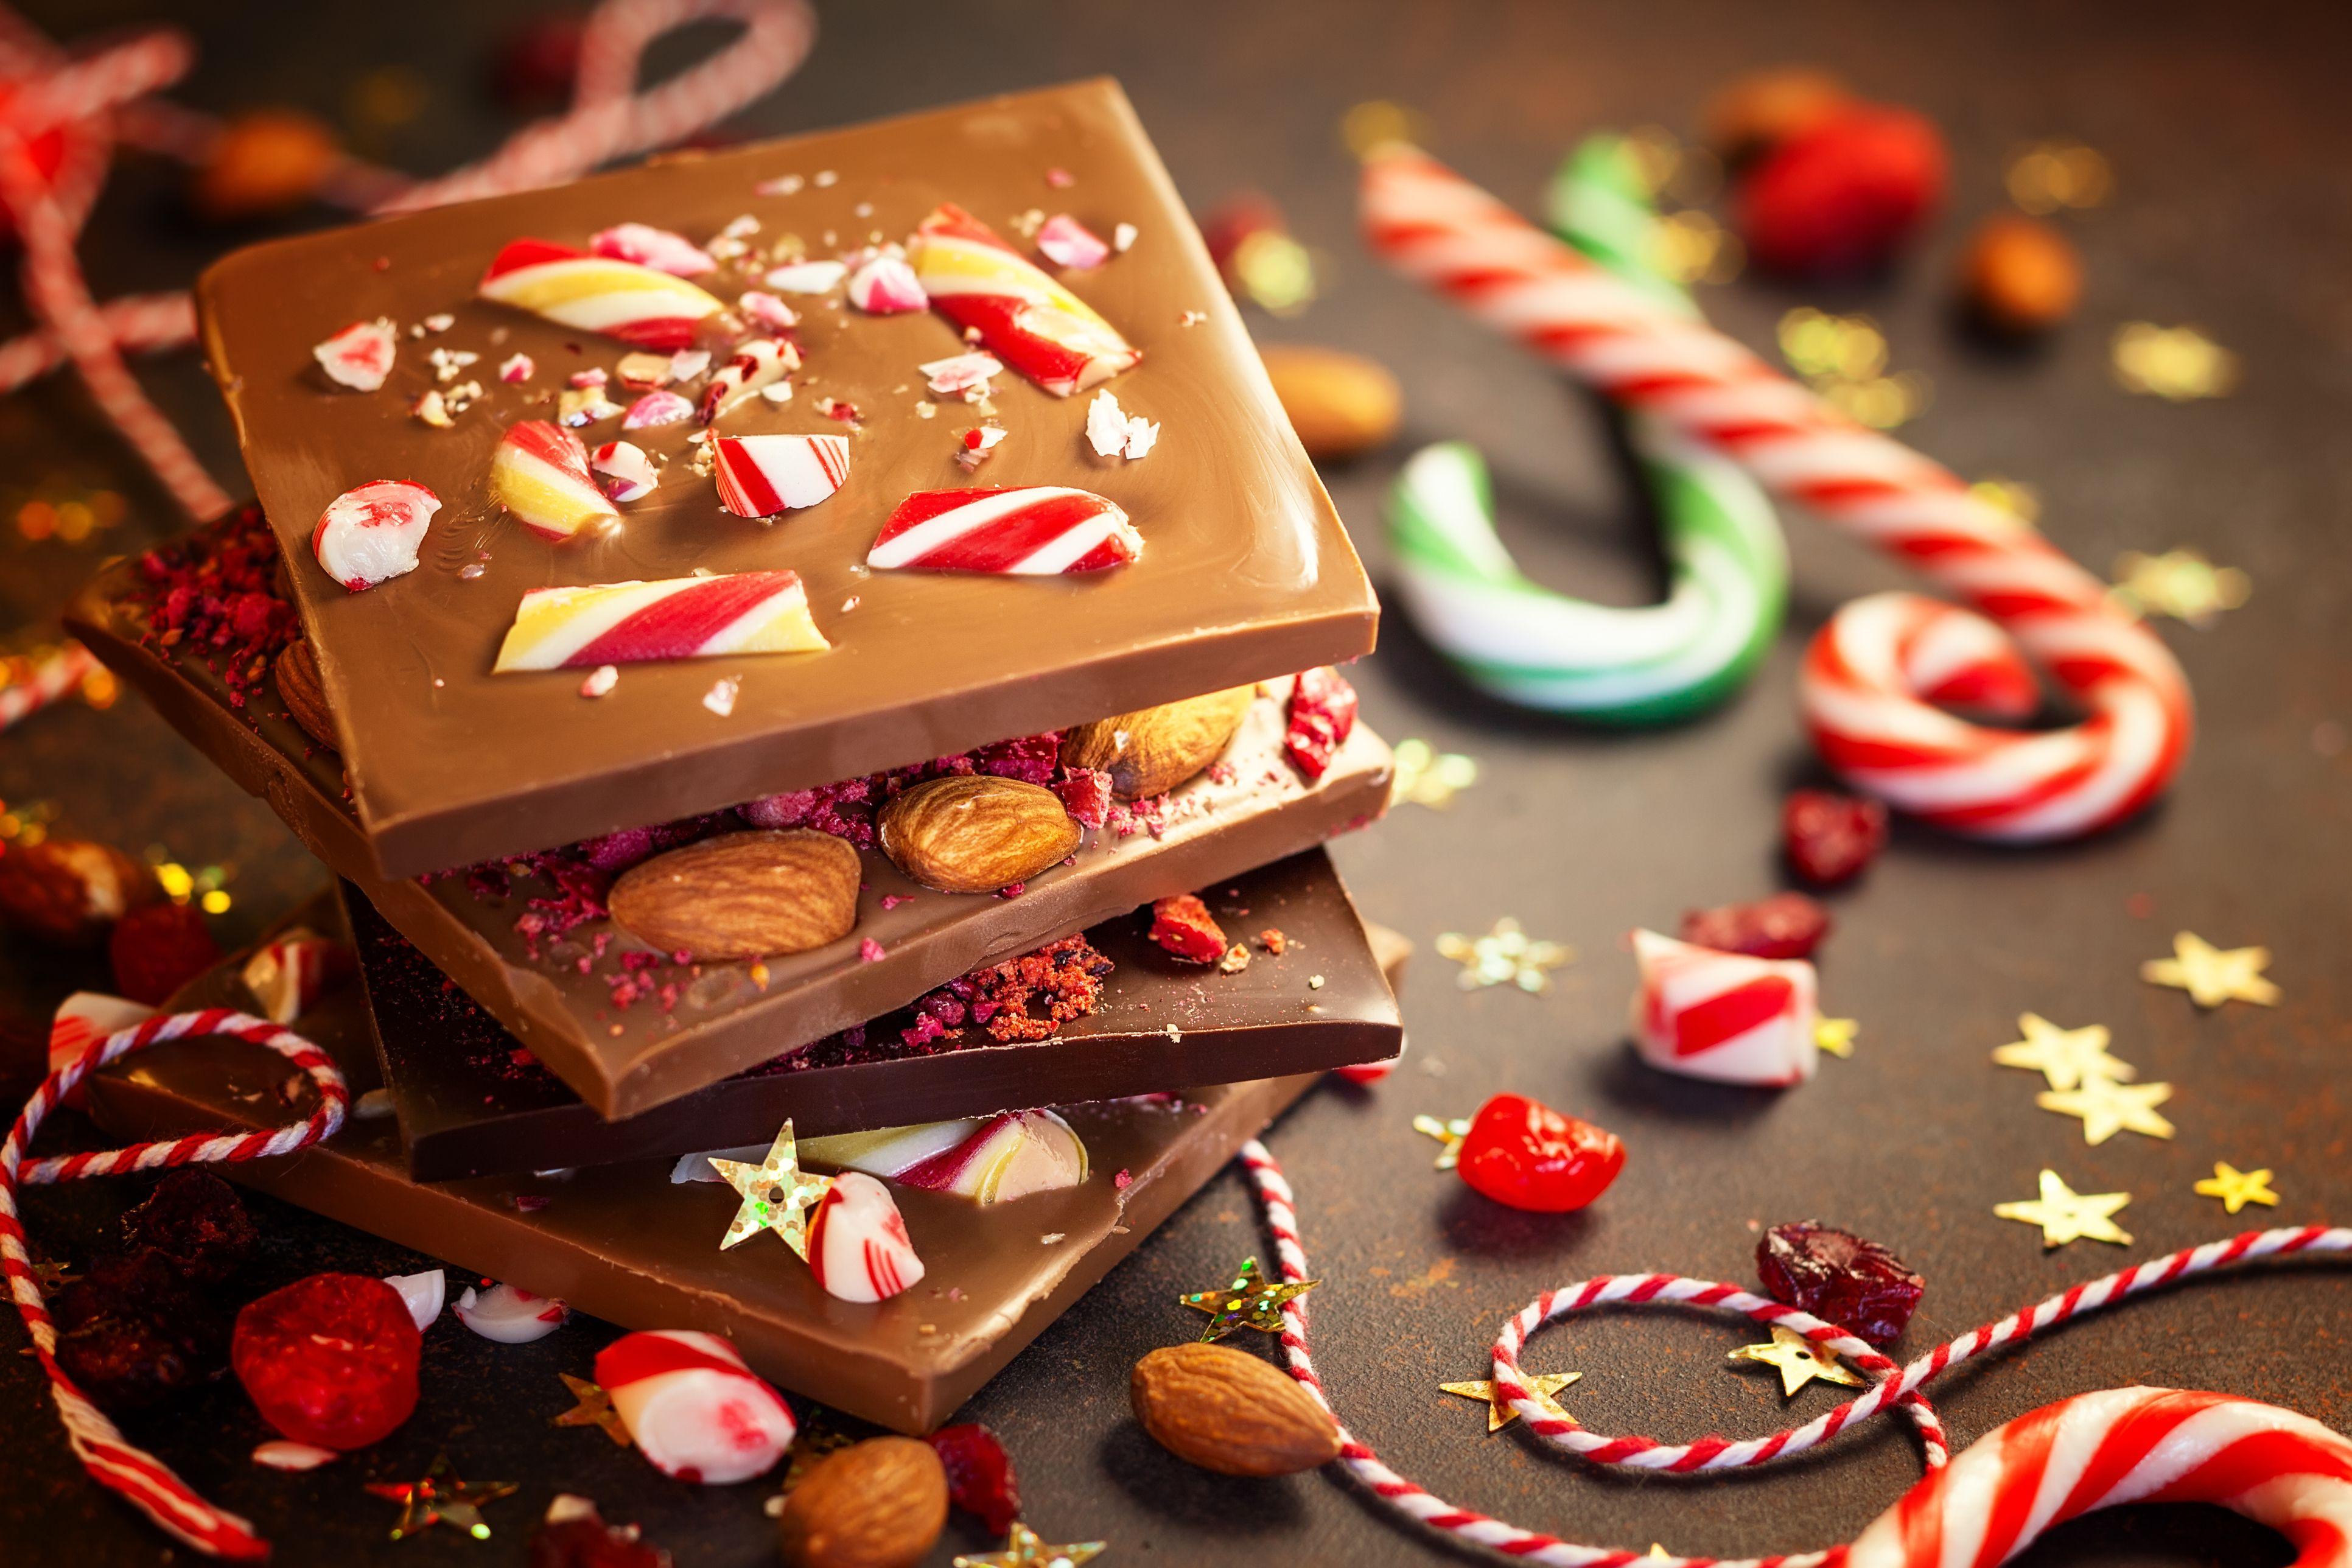 64 Easy Christmas Candy Recipes - Ideas for Homemade Christmas Candy